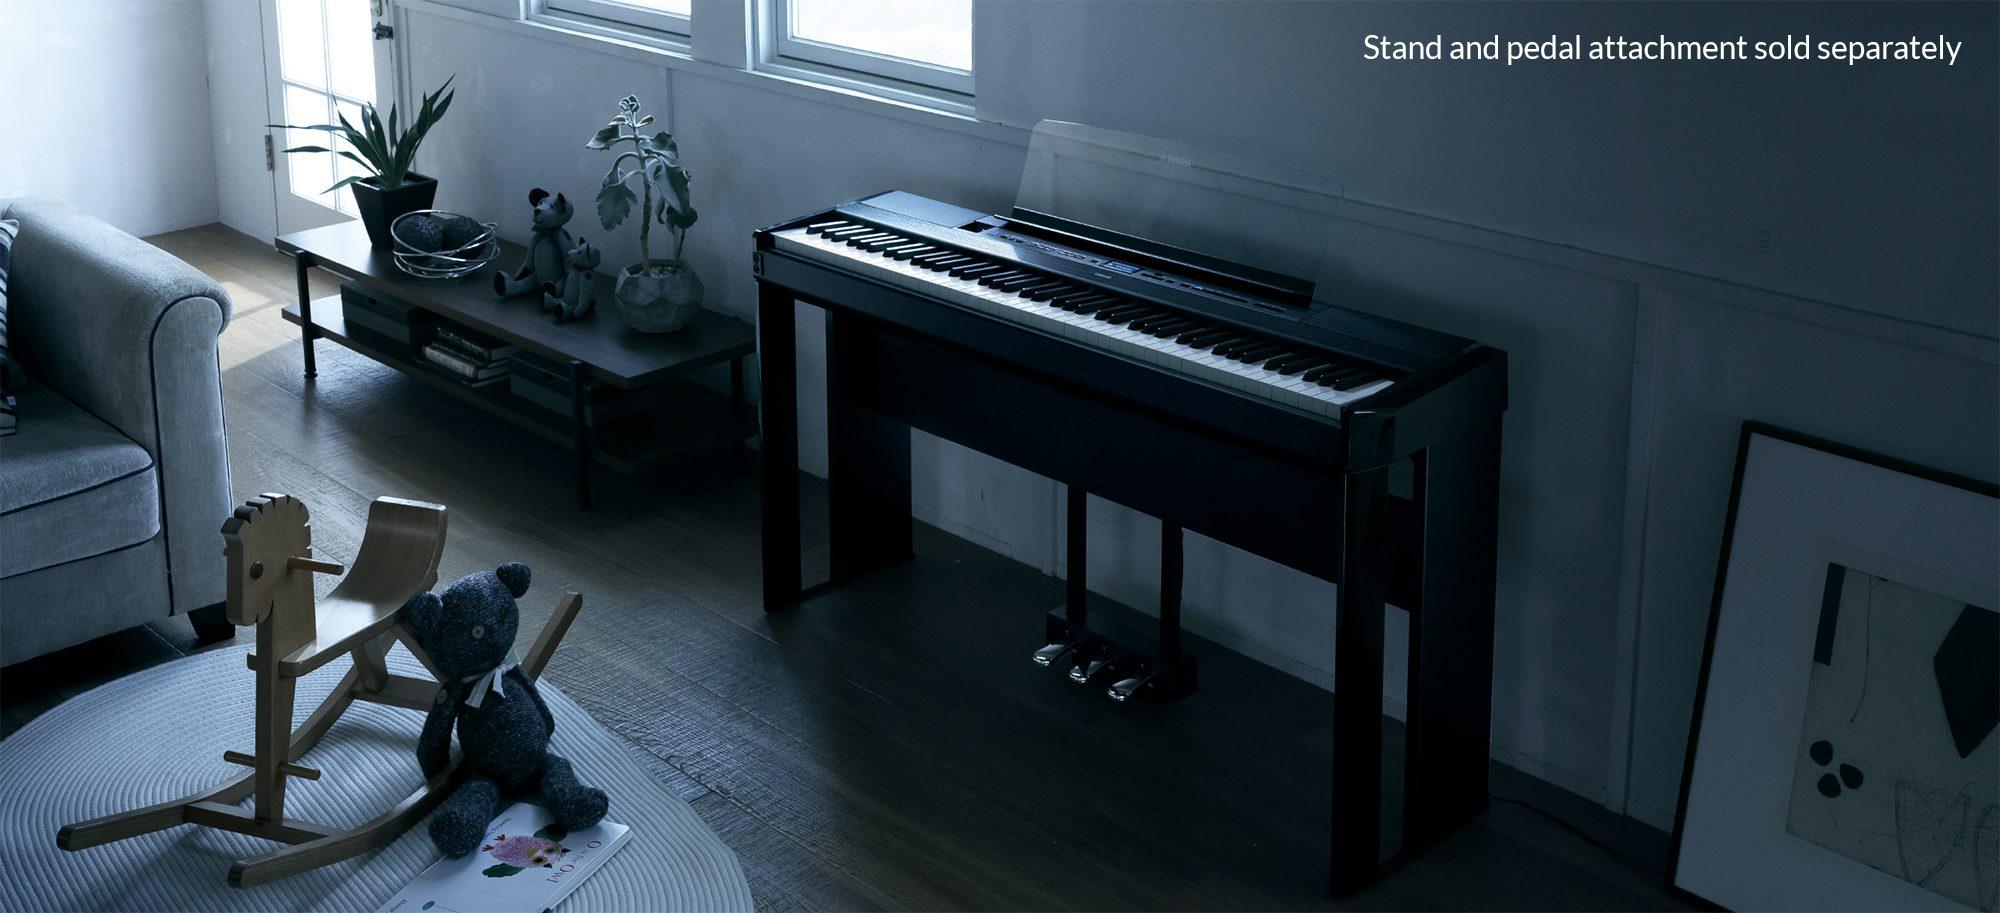 Yamaha P 515 Portable Digital Piano In Black Finish Music Fc5 Pedal Wiring Diagram